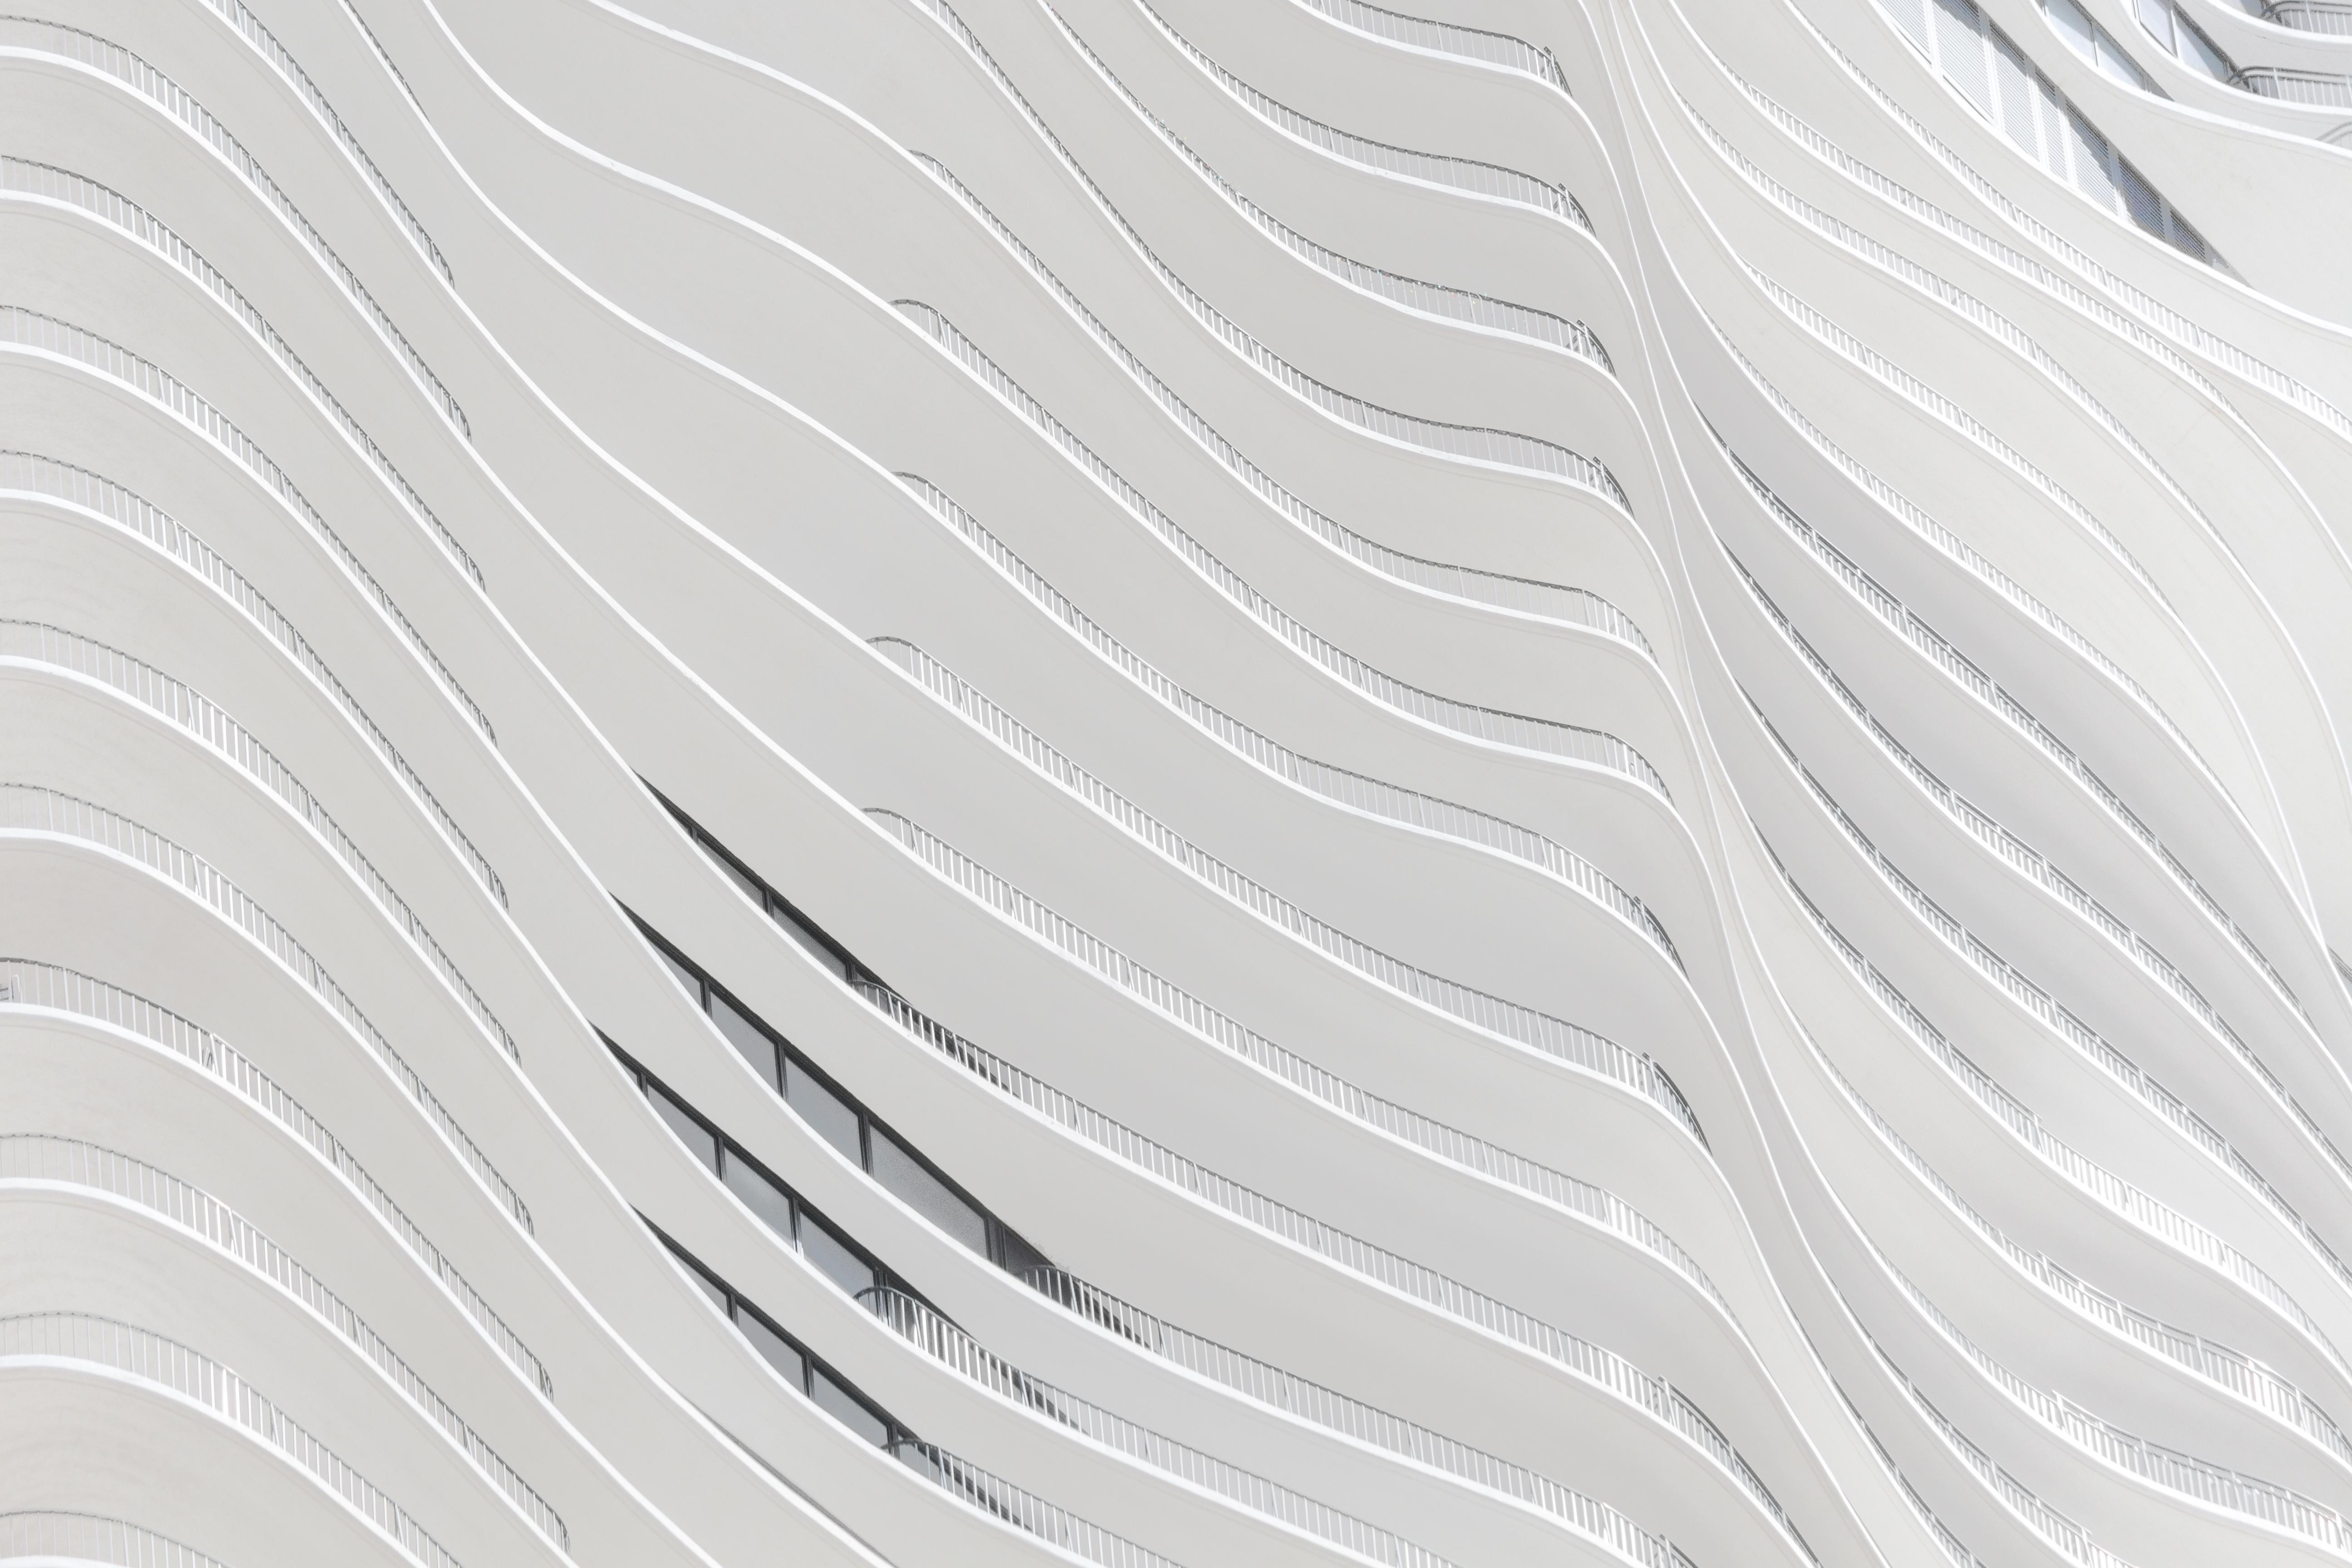 Abstraktes Gebäude